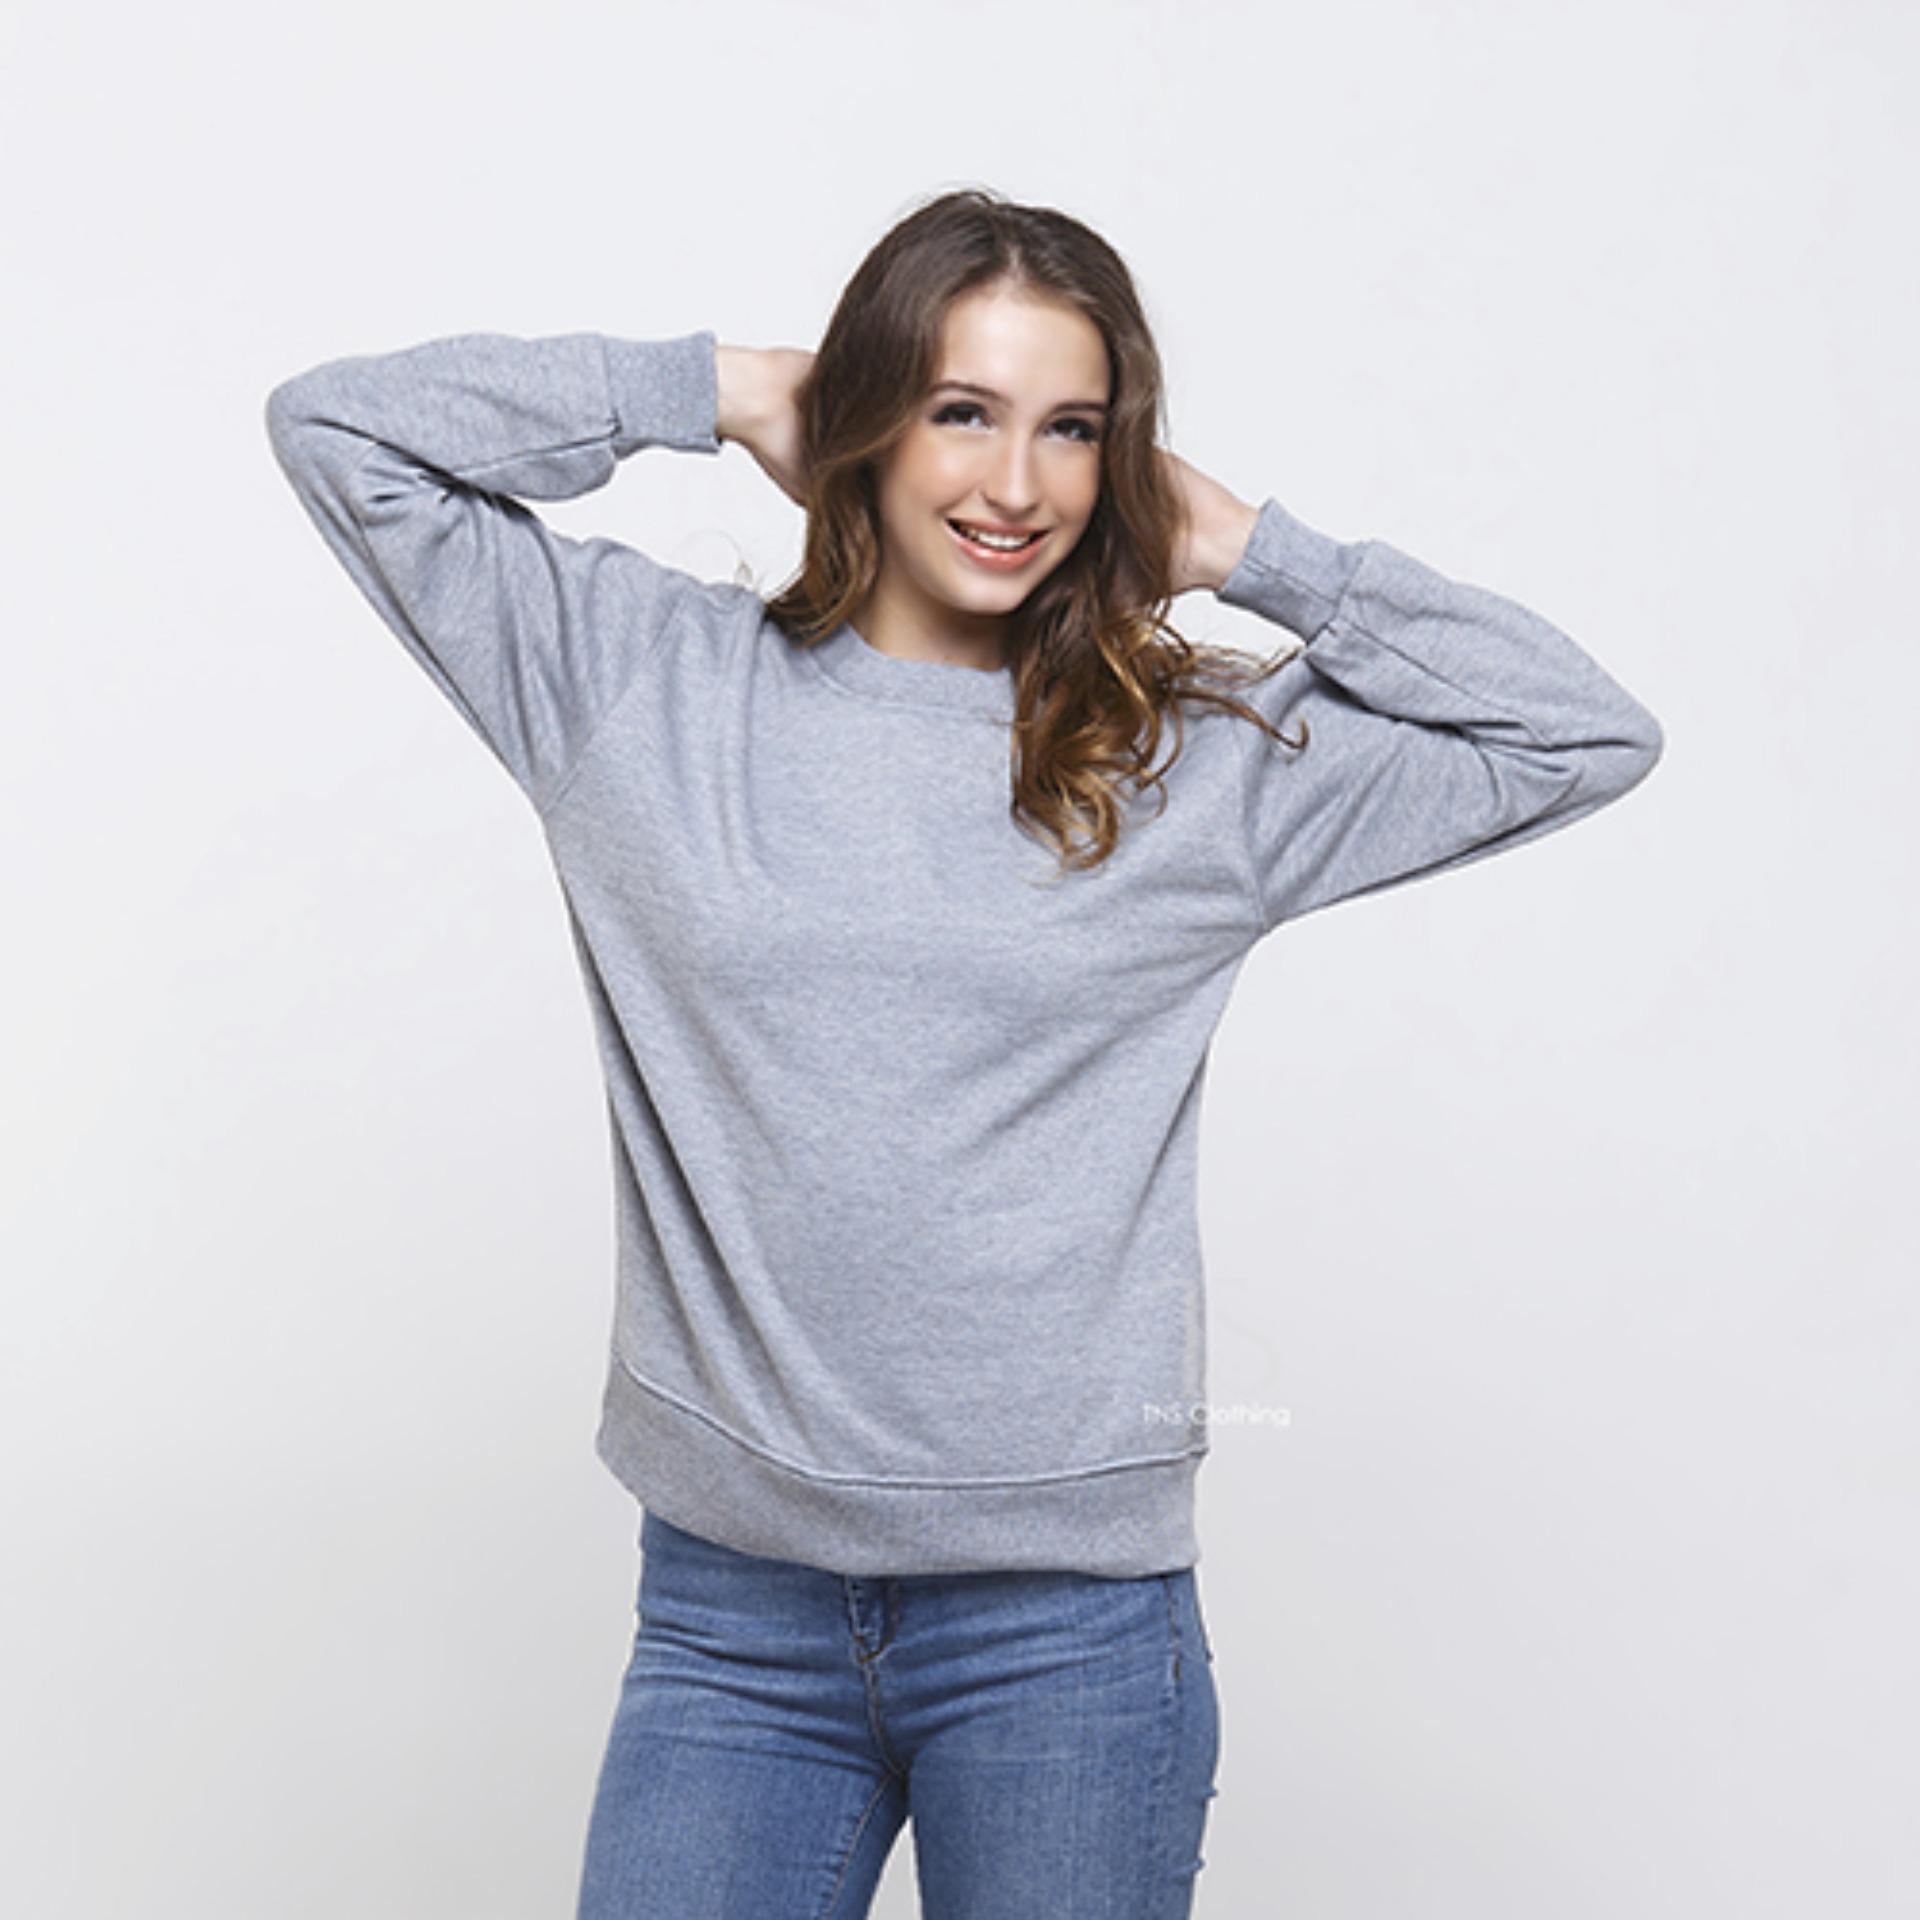 ... M Xl Source · Bajukitaindonesia Jaket Basic Sweater Polos ABUMUDA Pria danWanita